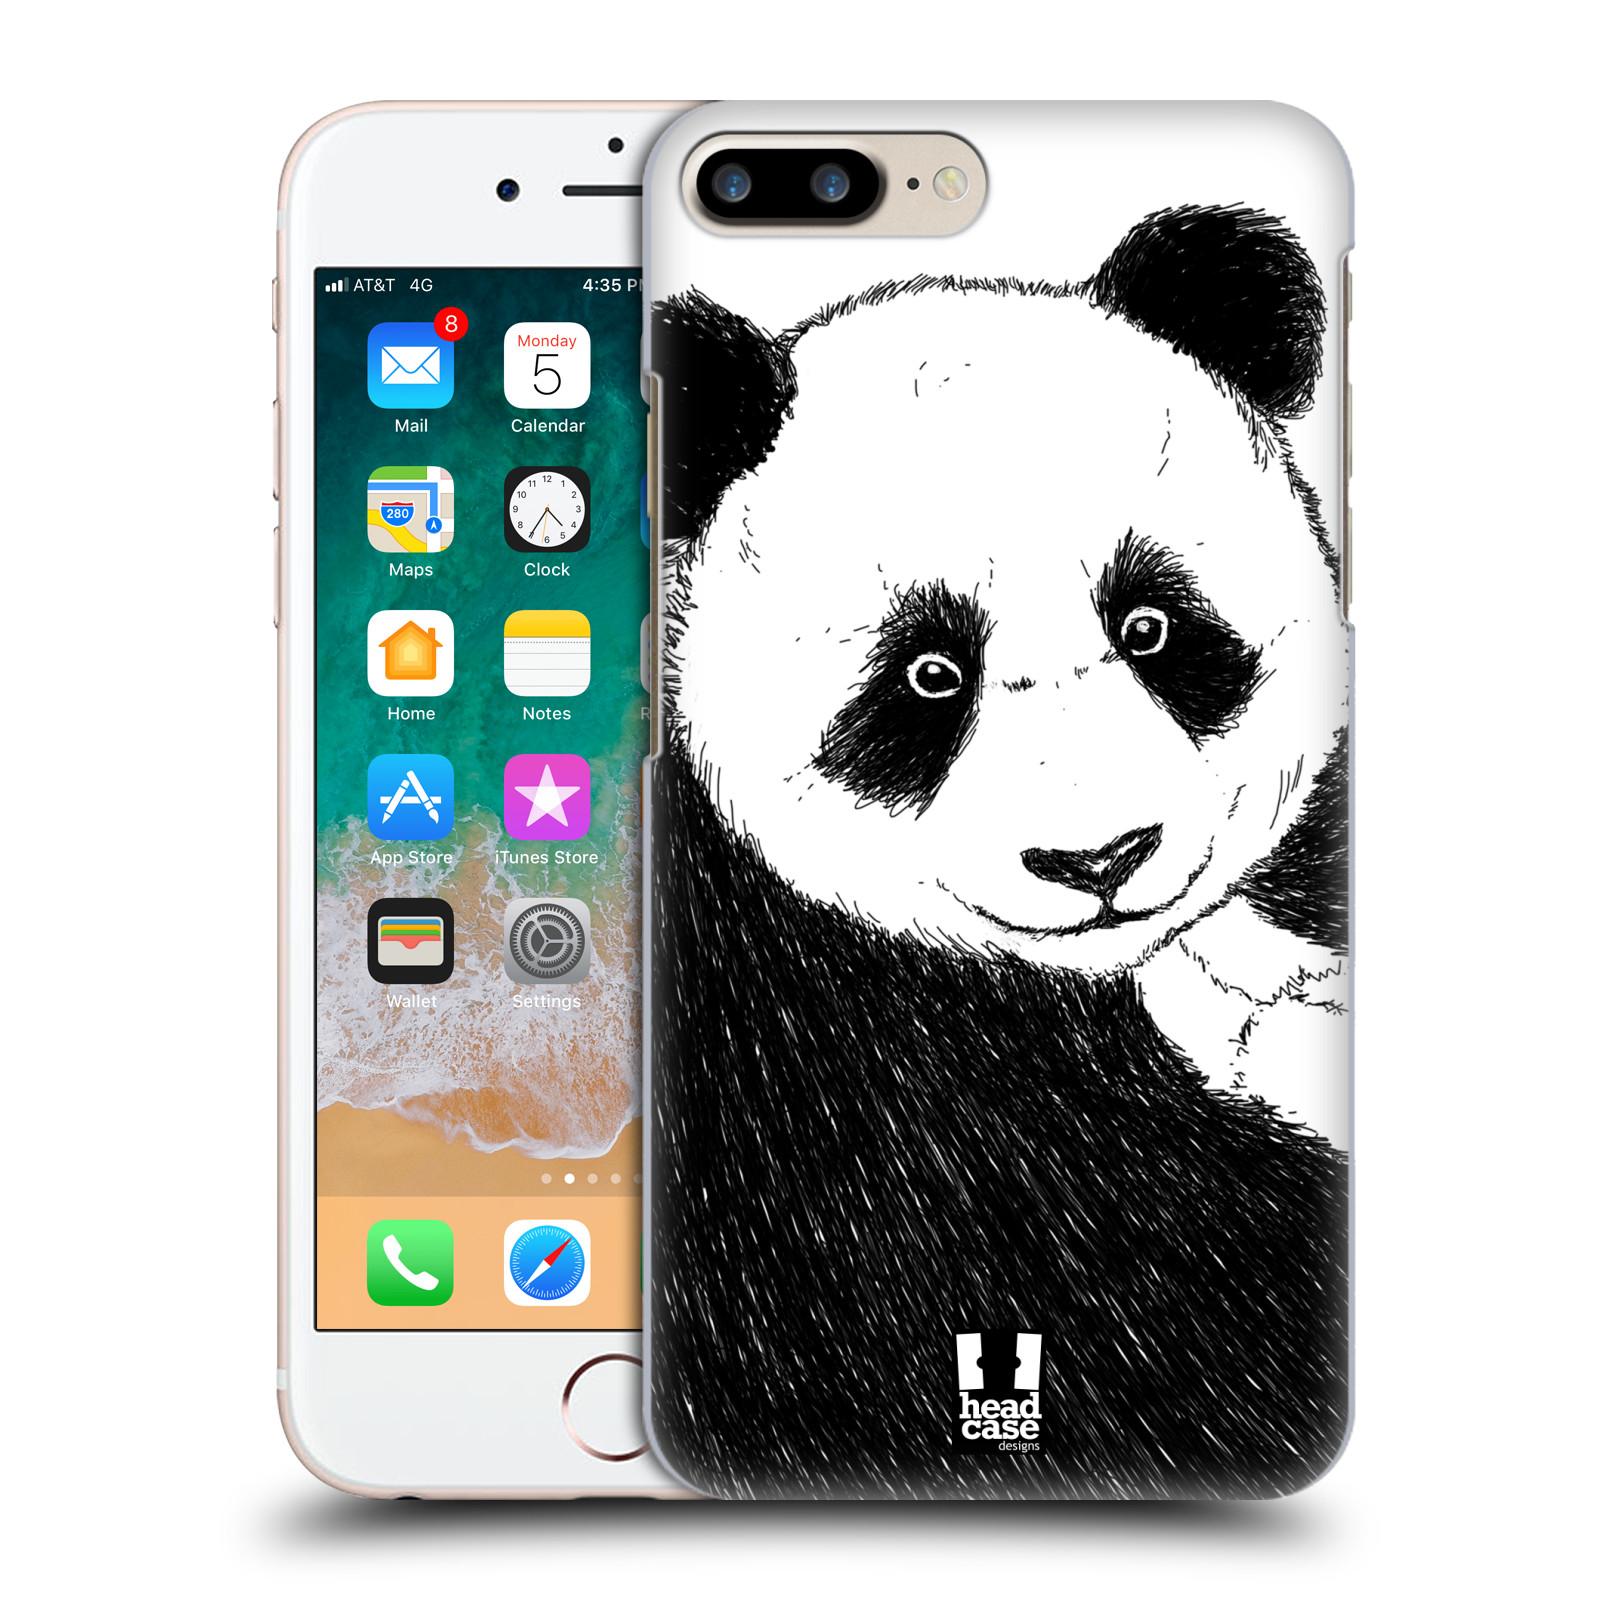 HEAD CASE plastový obal na mobil Apple Iphone 7 PLUS vzor Kreslená zvířátka černá a bílá panda